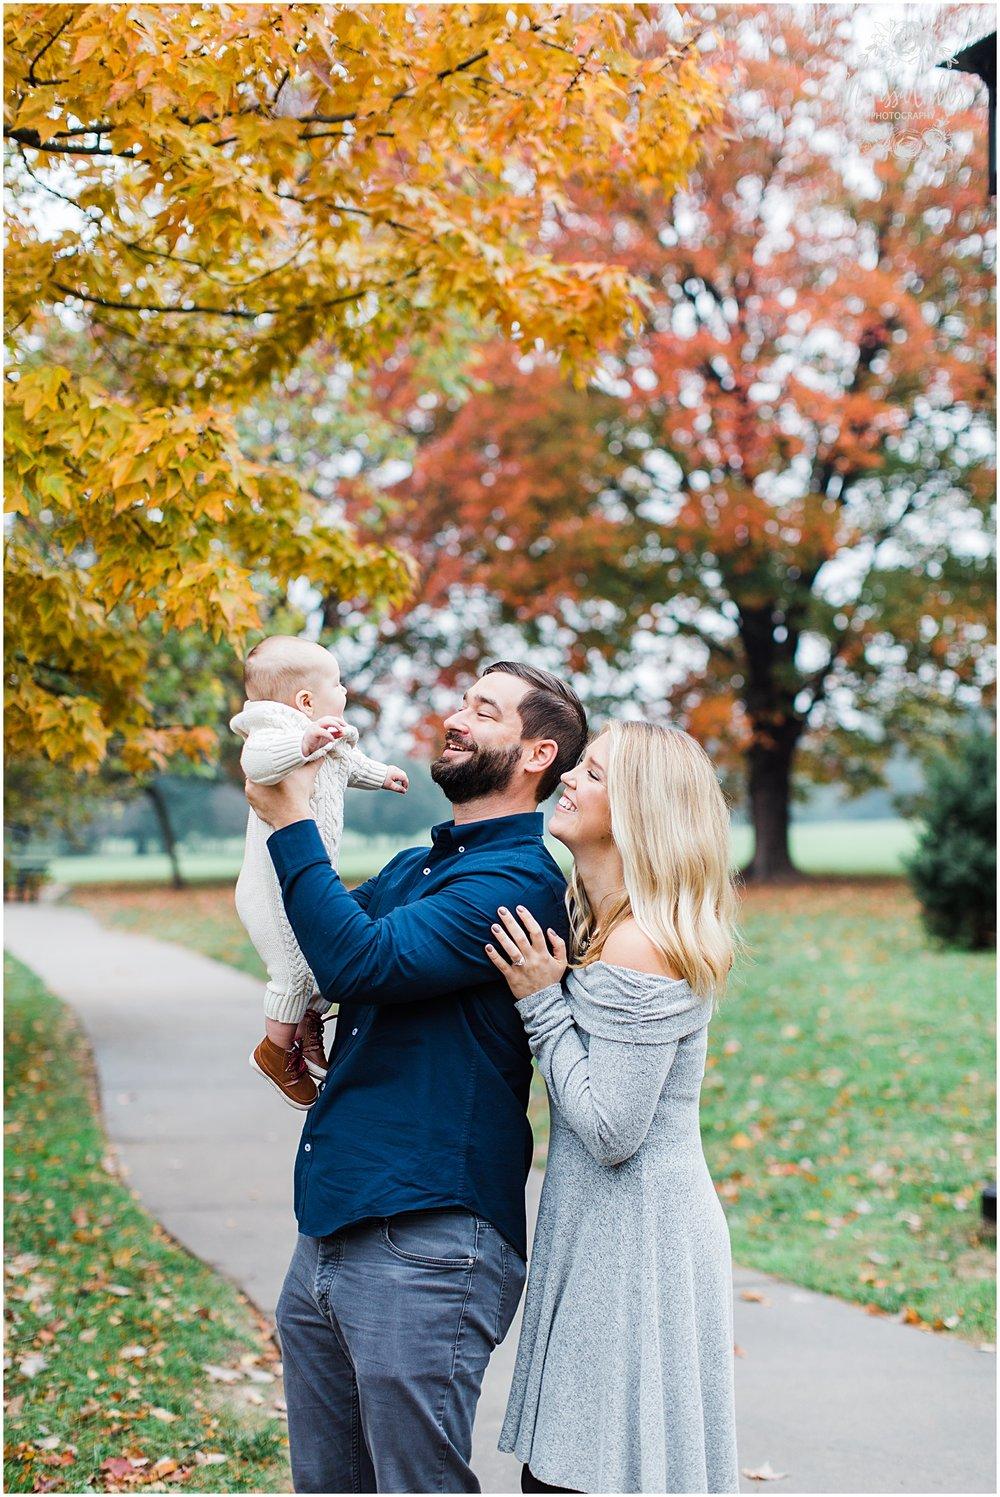 MILLER FAMILY LOOSE PARK | MARISSA CRIBBS PHOTOGRAPHY | KC FAMILY PHOTOGRAPHY_3797.jpg